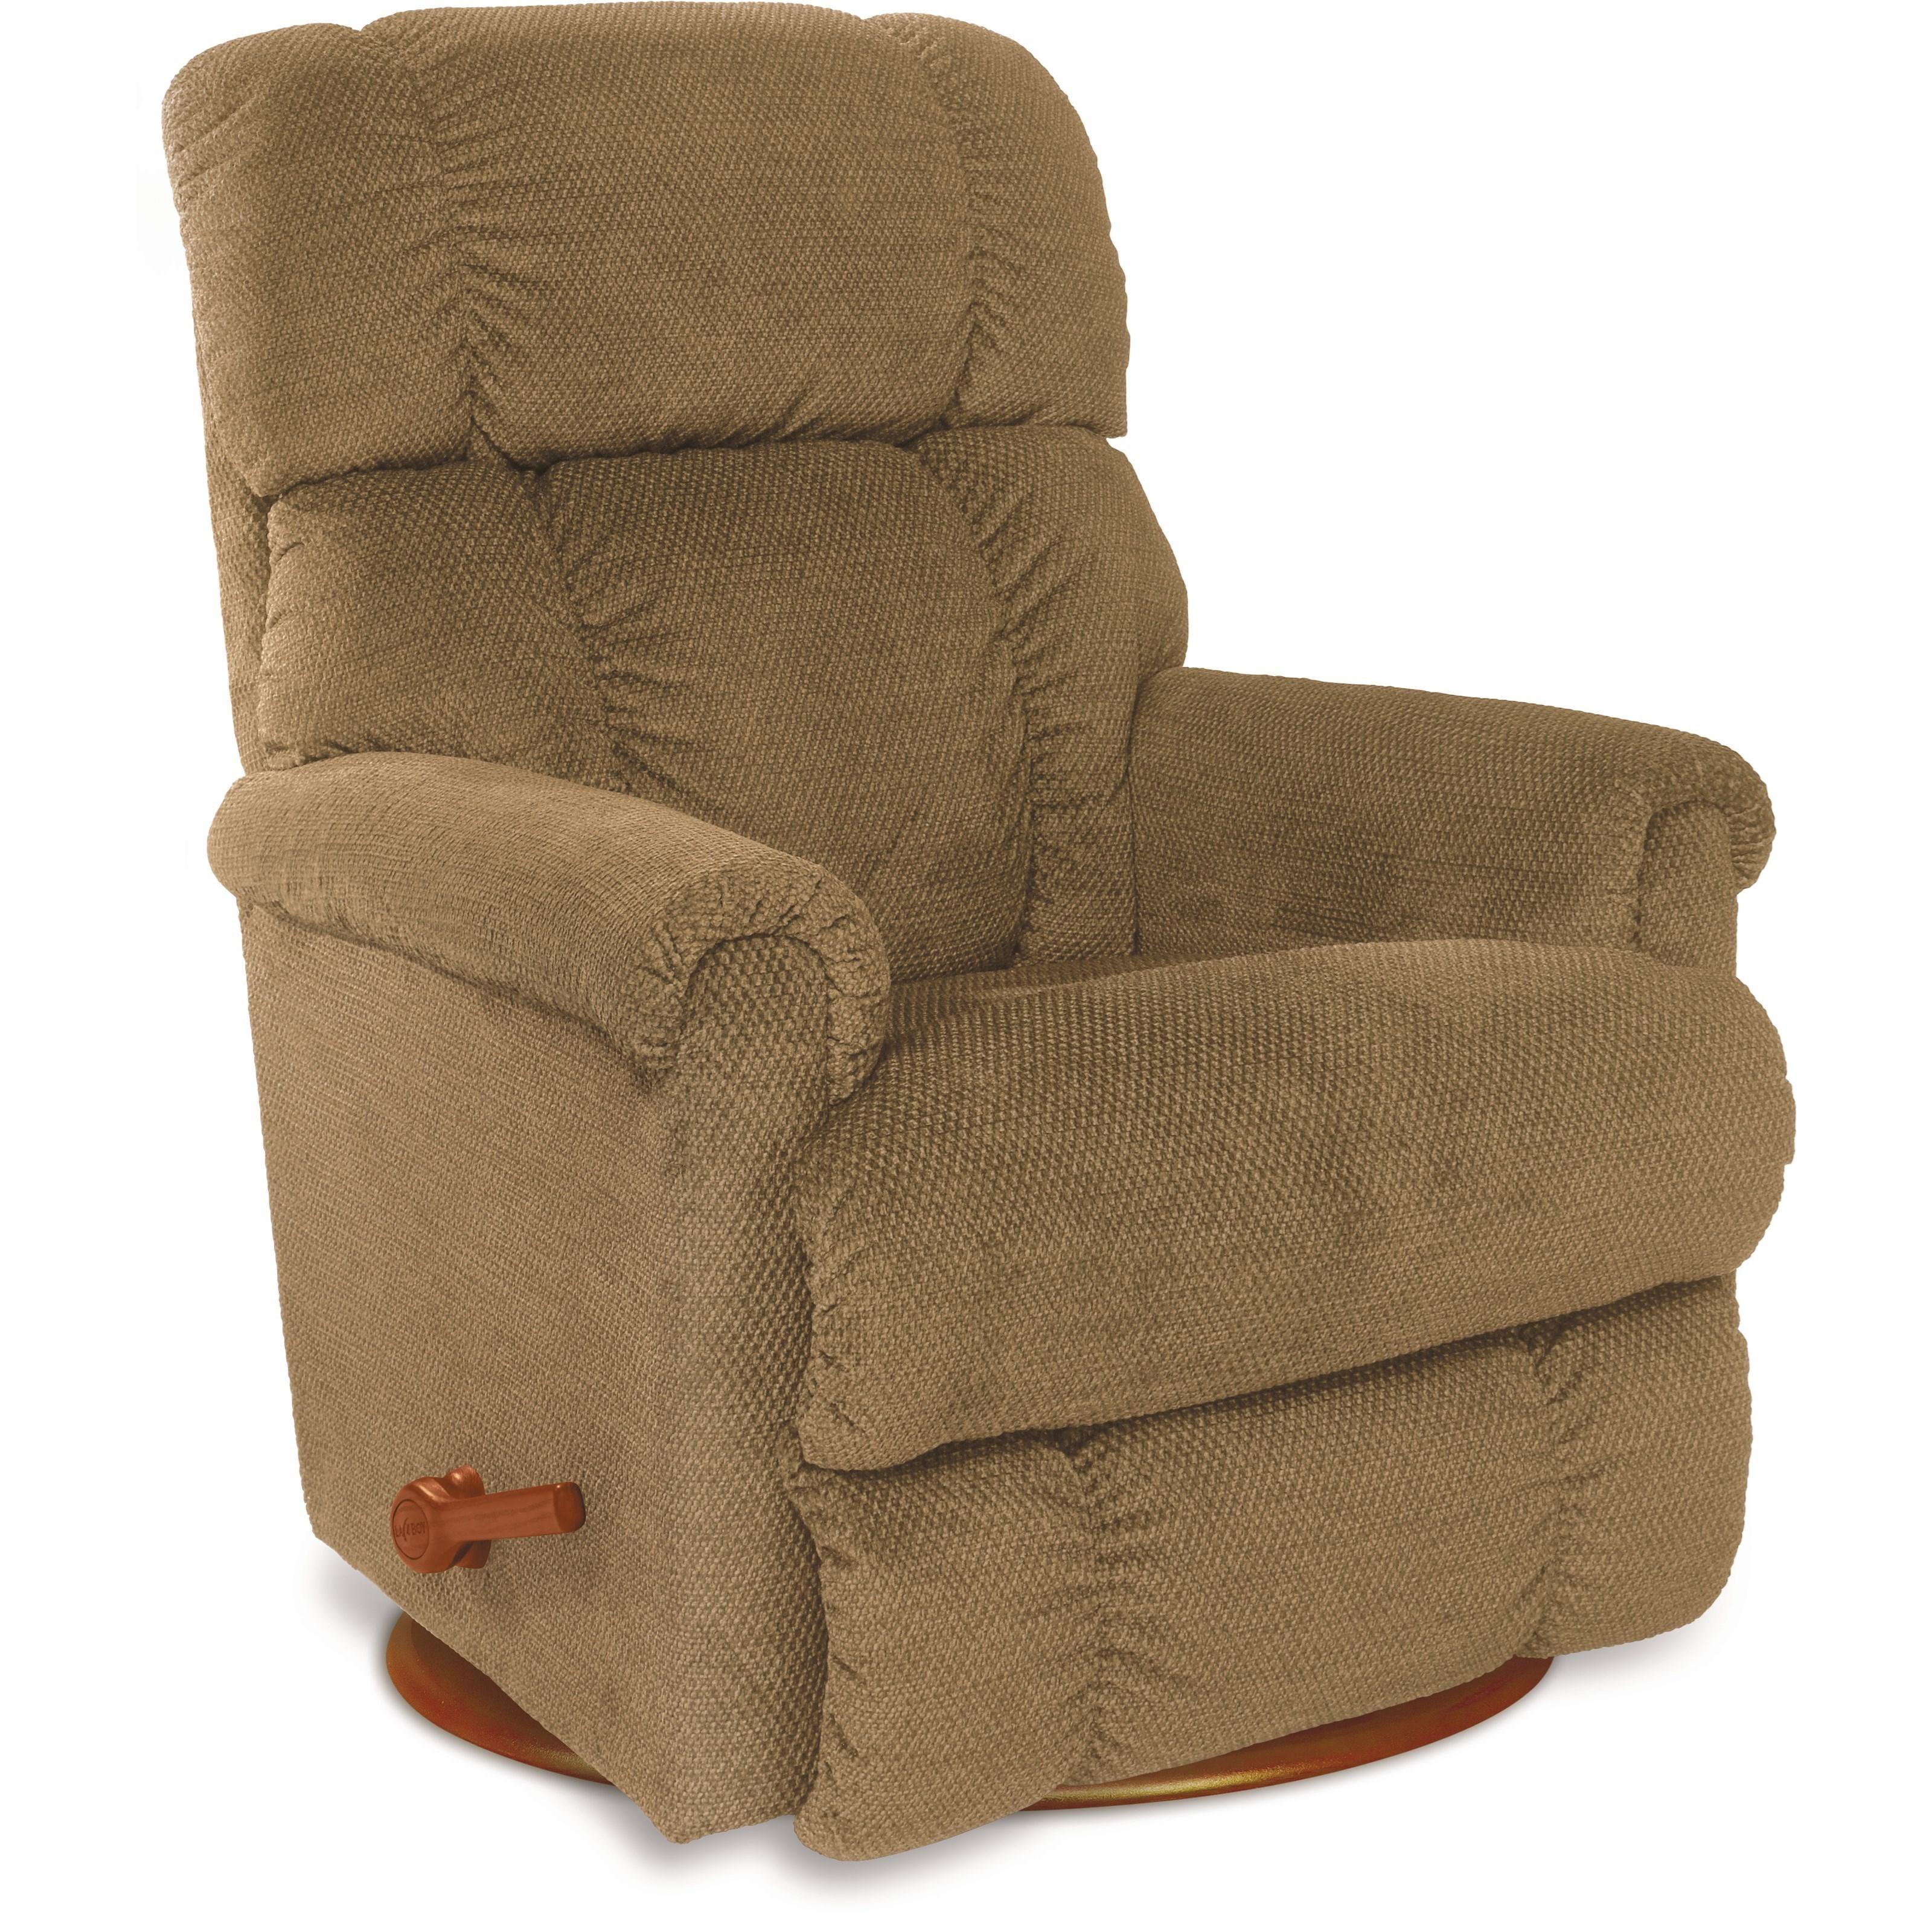 la z boy swivel chair custom barber chairs atlanta pinnacle reclina glider rocker recliner